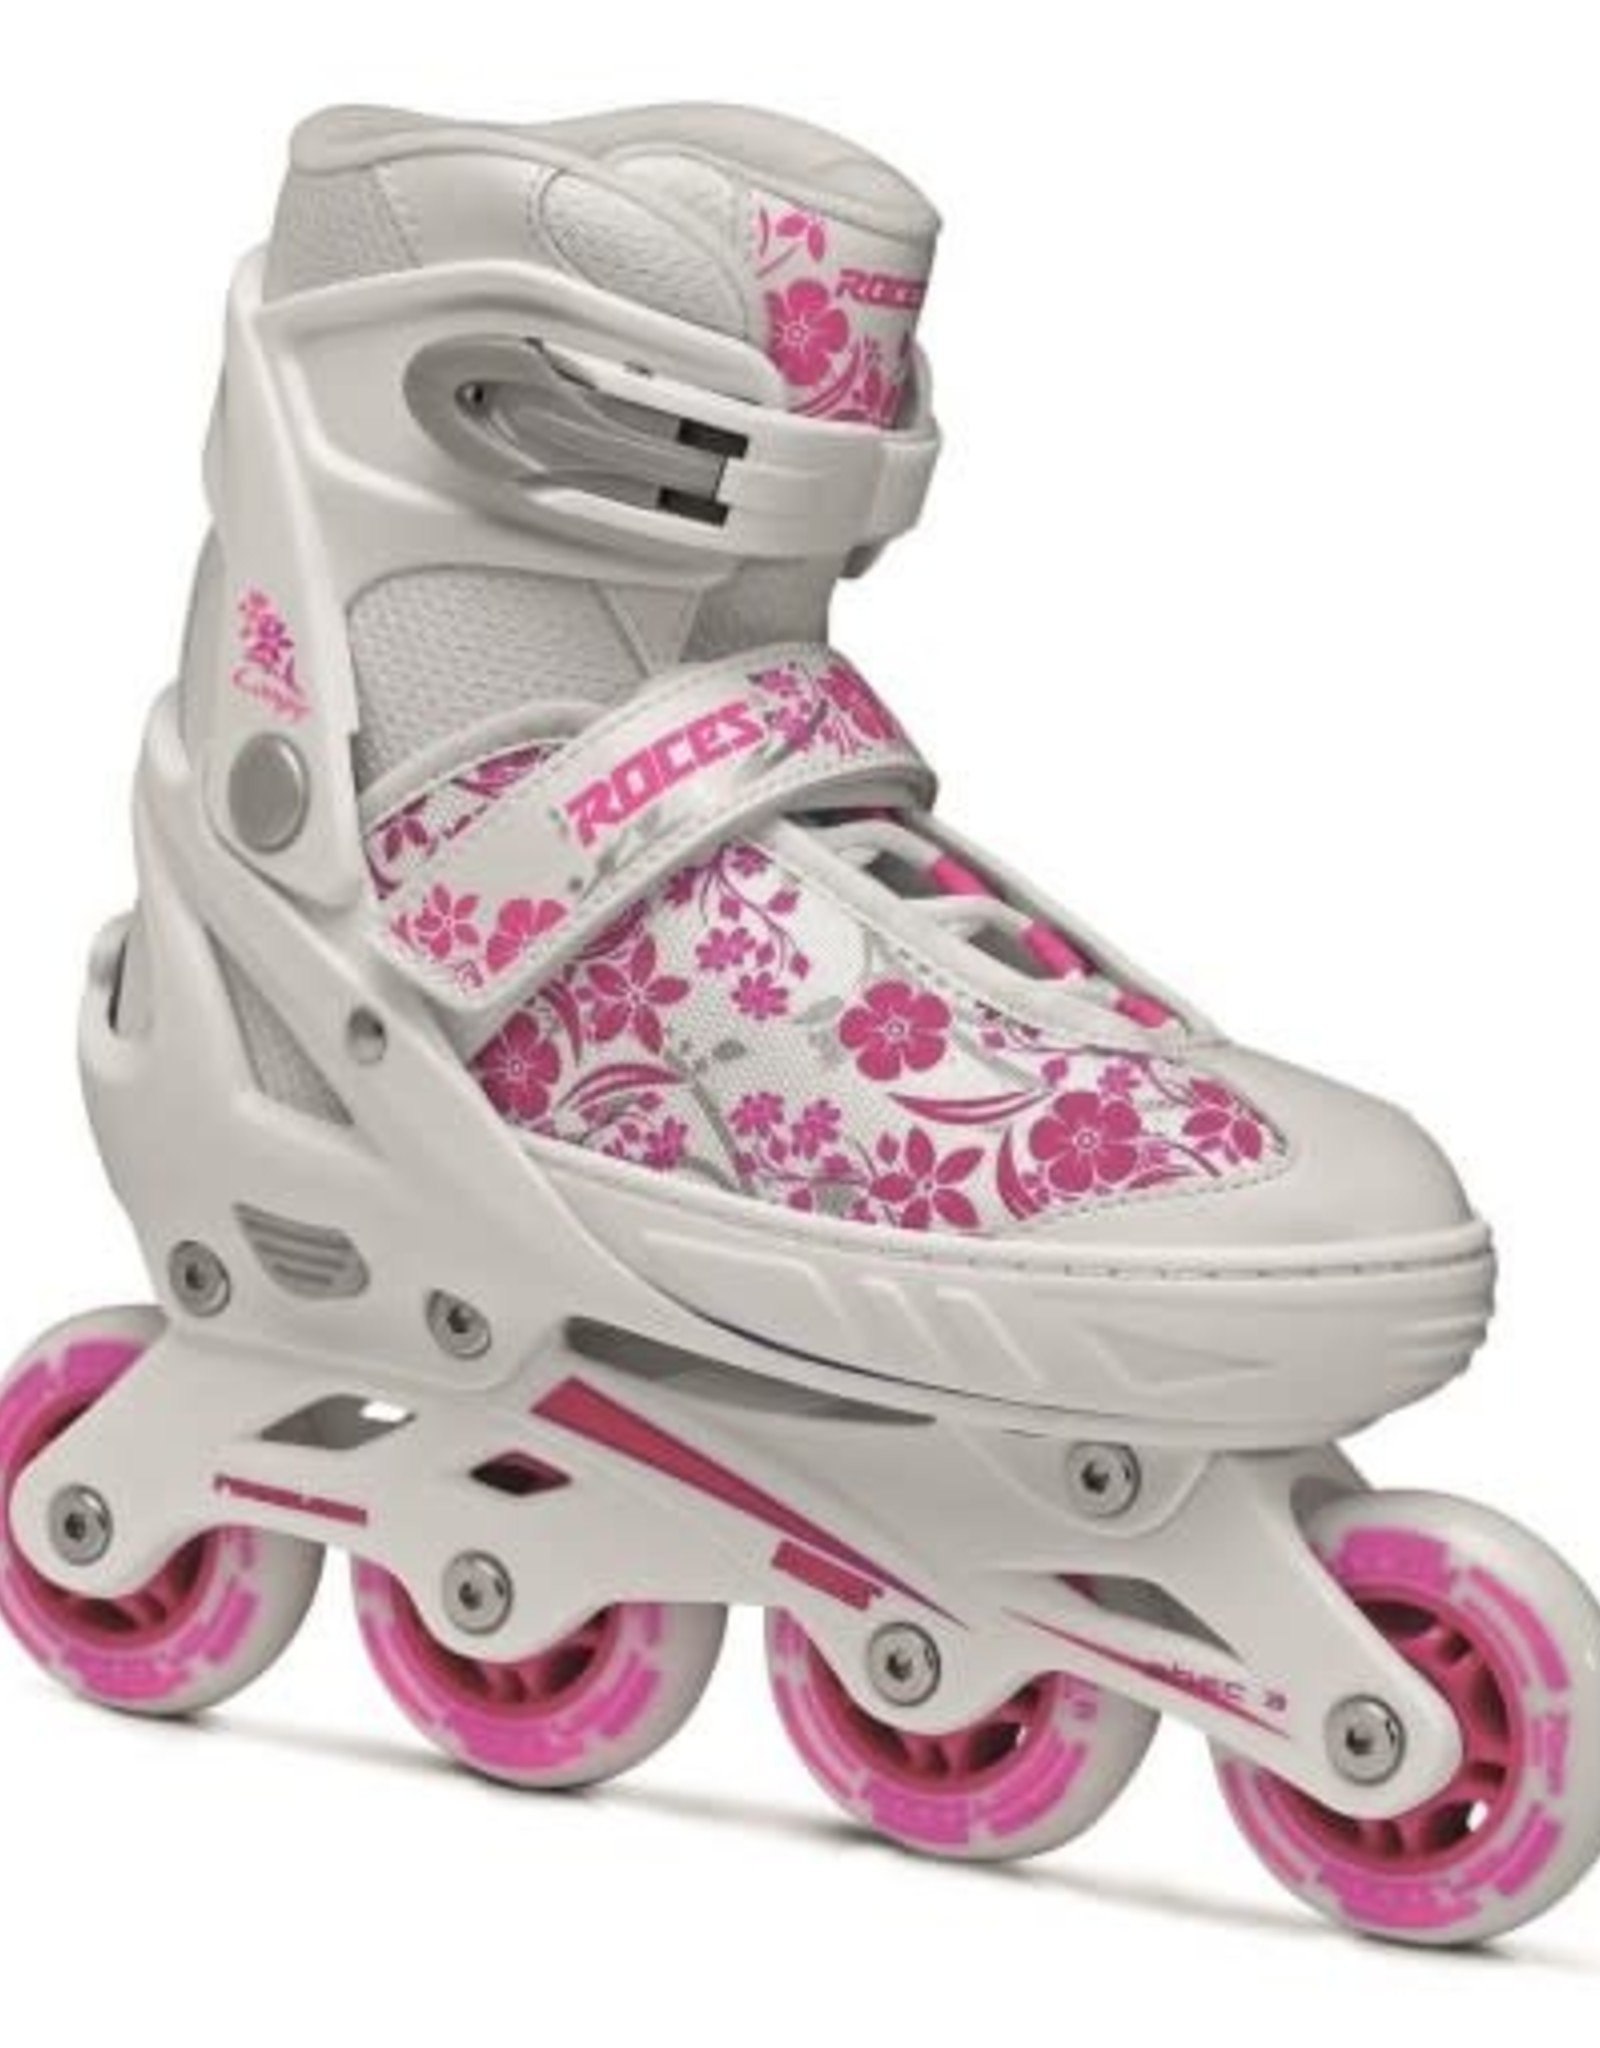 Roces COMPY 8.0 GIRL Kinder Verstelbare Inline Skate